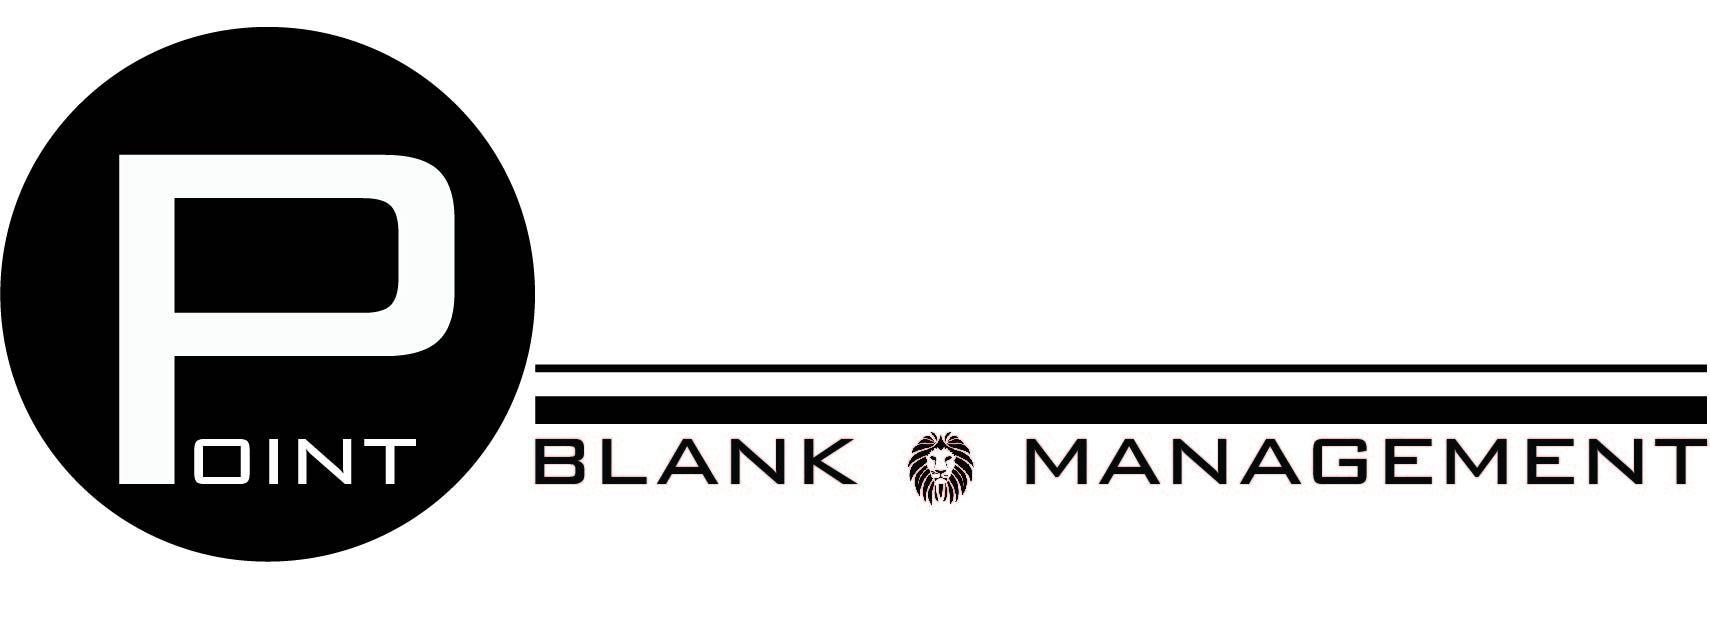 Point Blank Management